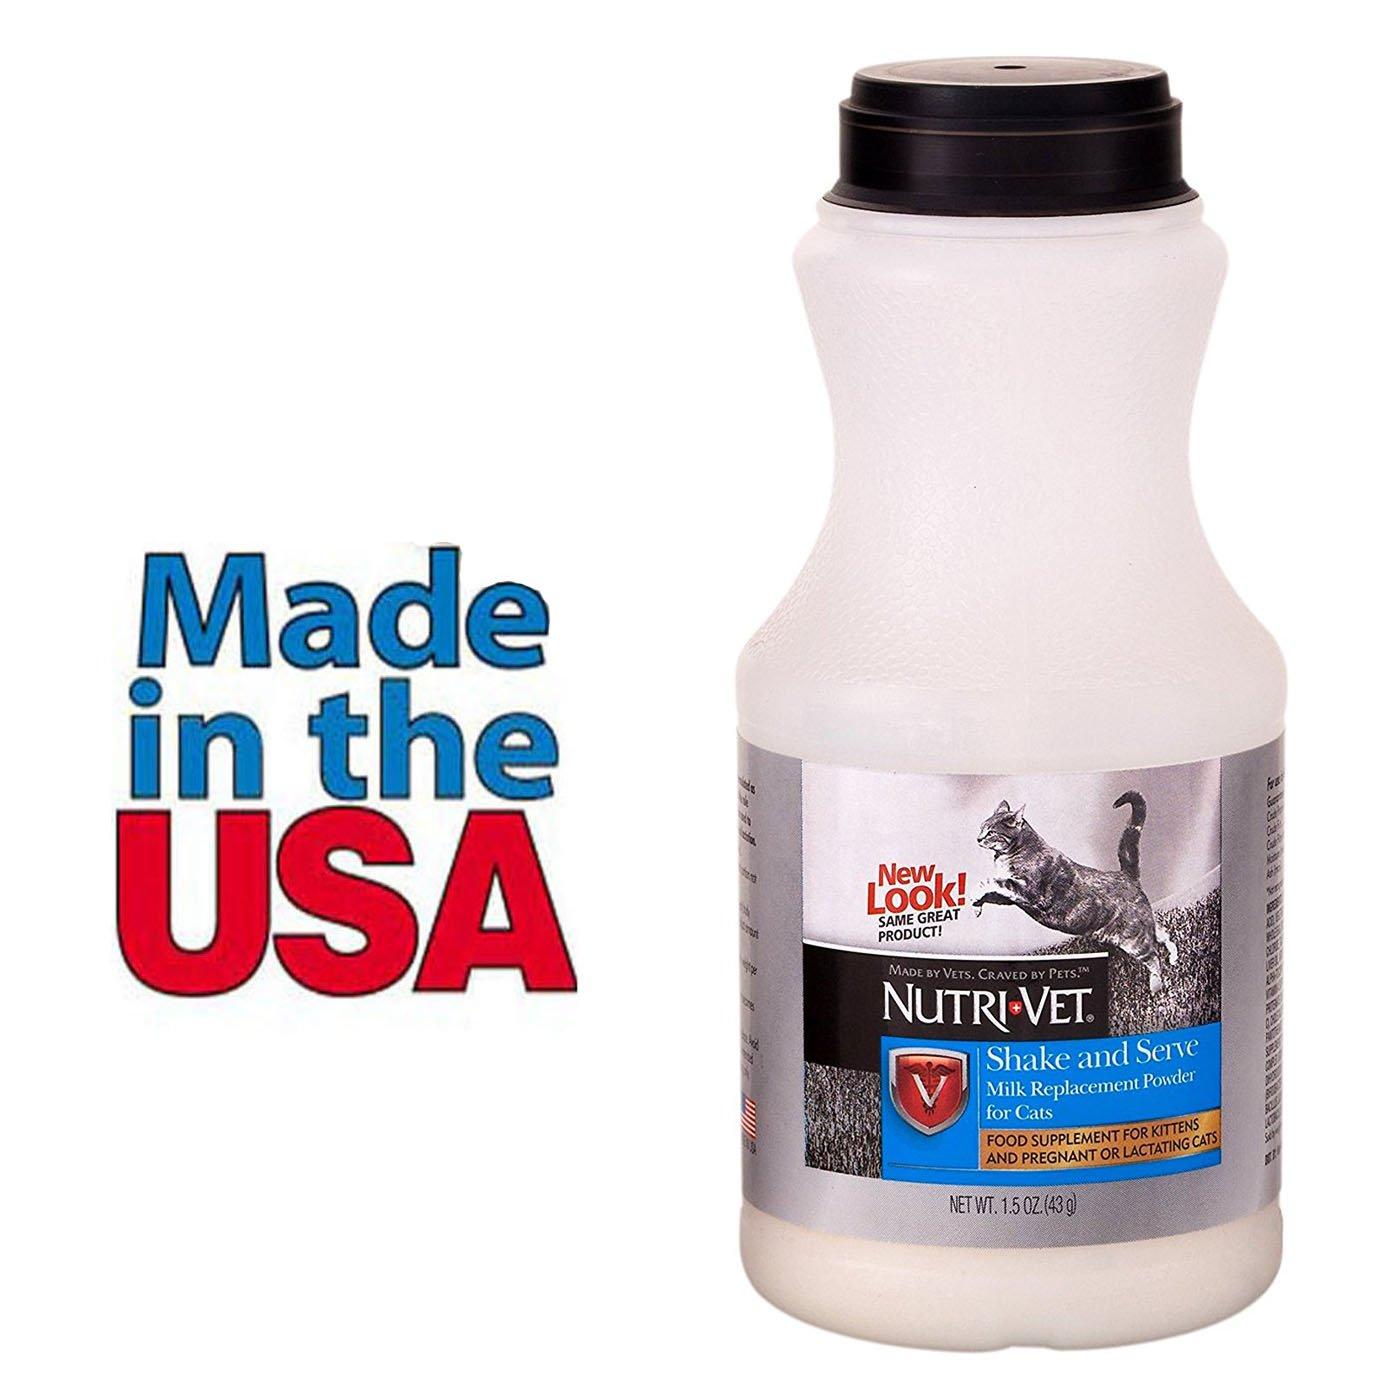 Buy Enfamama Milk Powder For Pregnant And Lactating